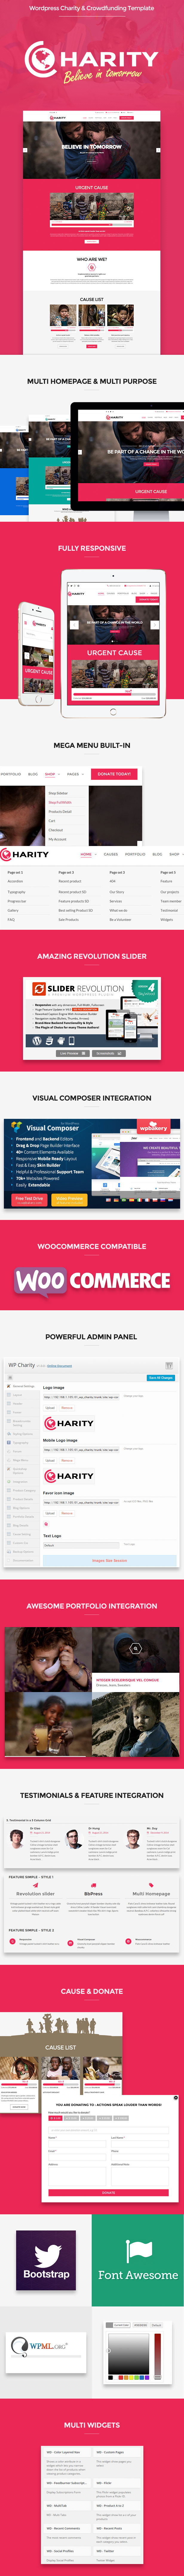 Wordpress Charity